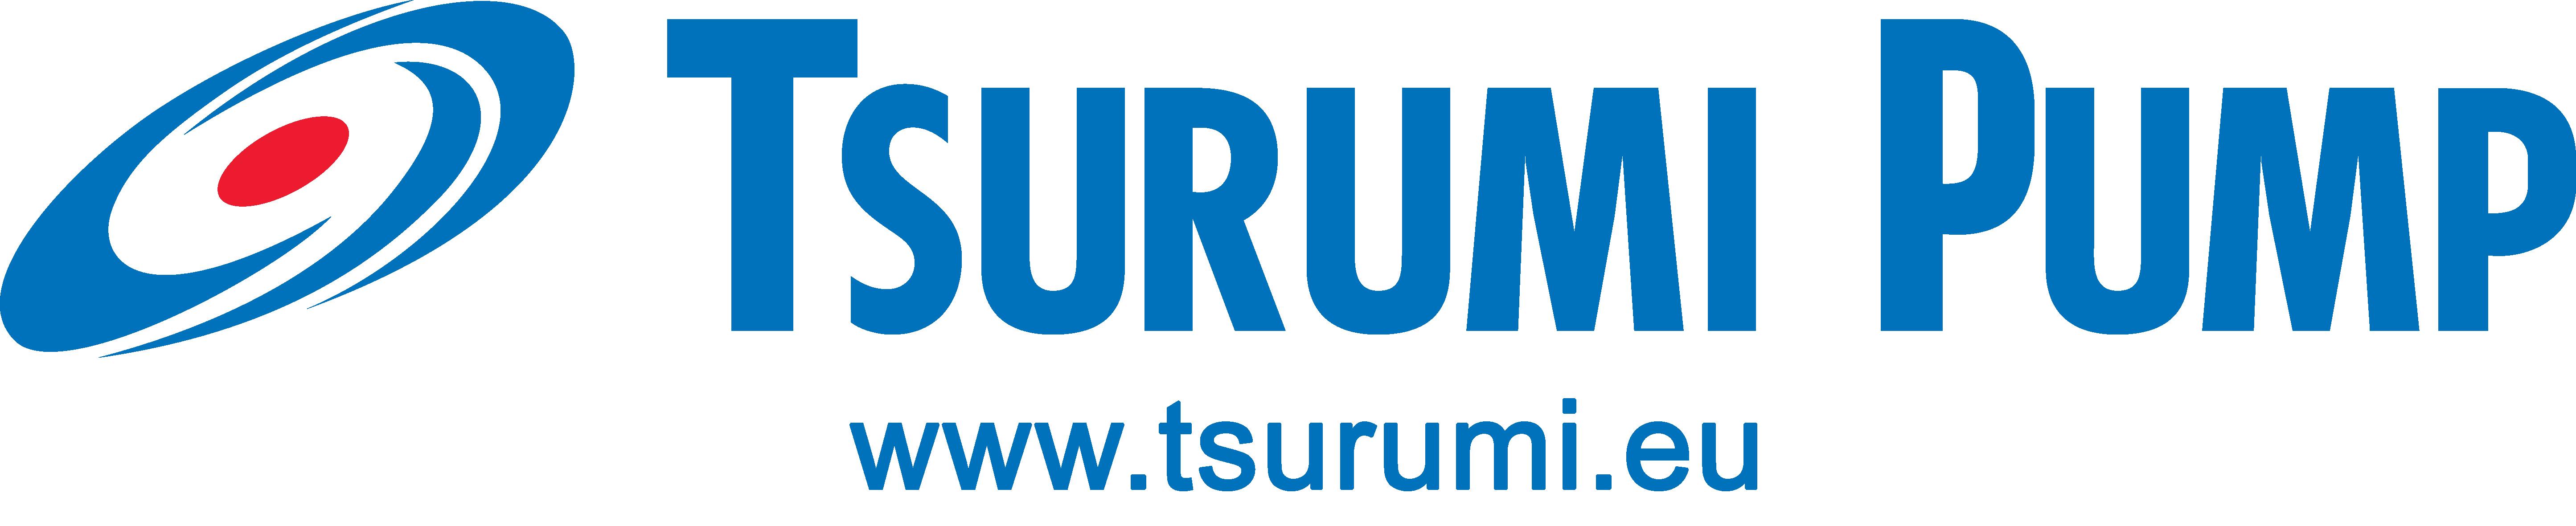 Tsurumi Pump Europe : Darkness favours secrets